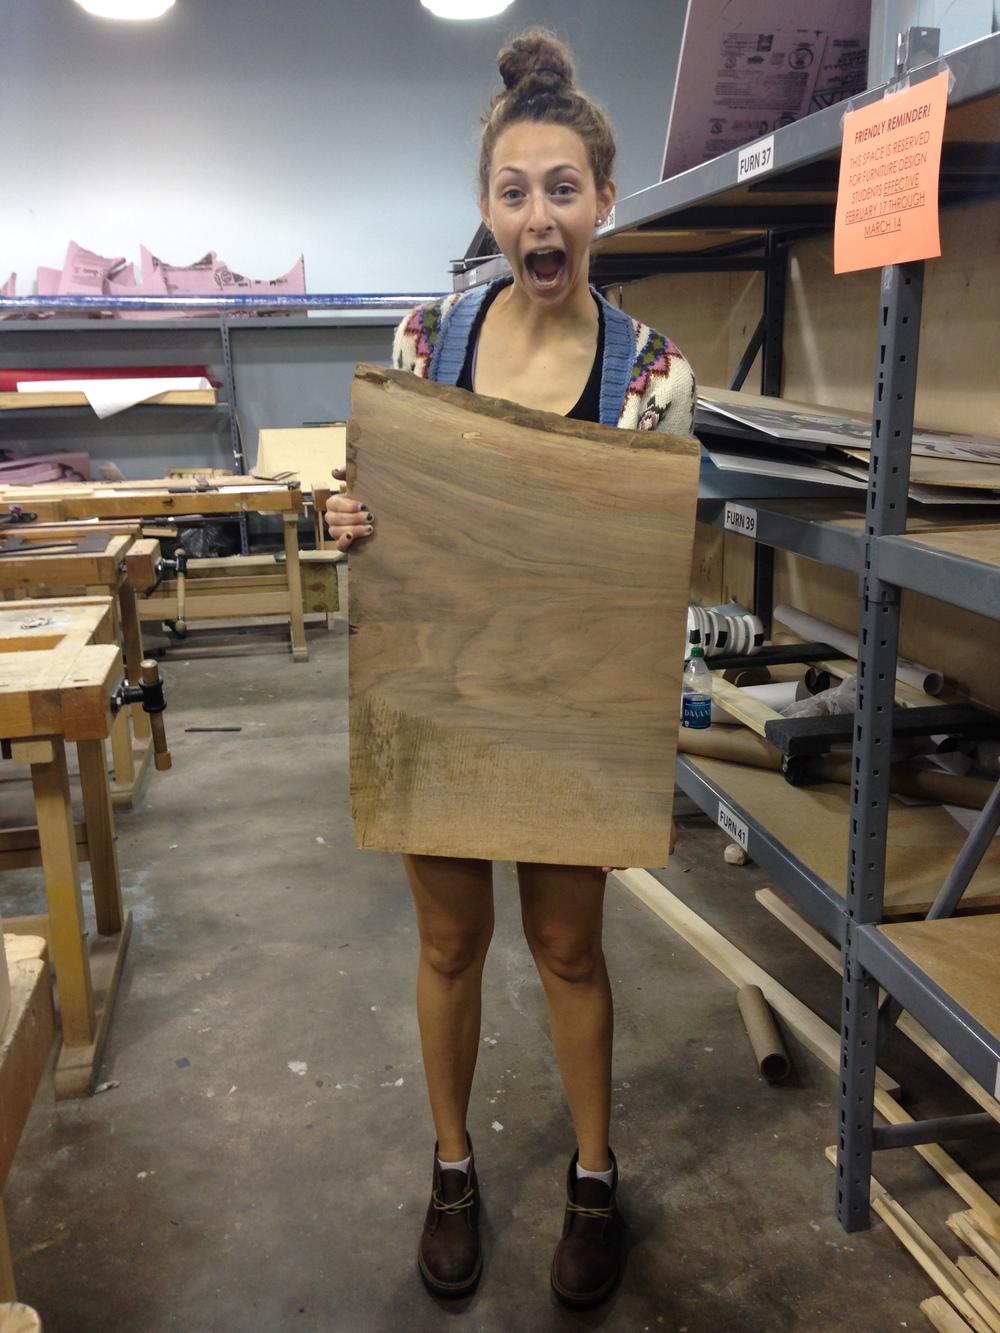 Lumber - Check